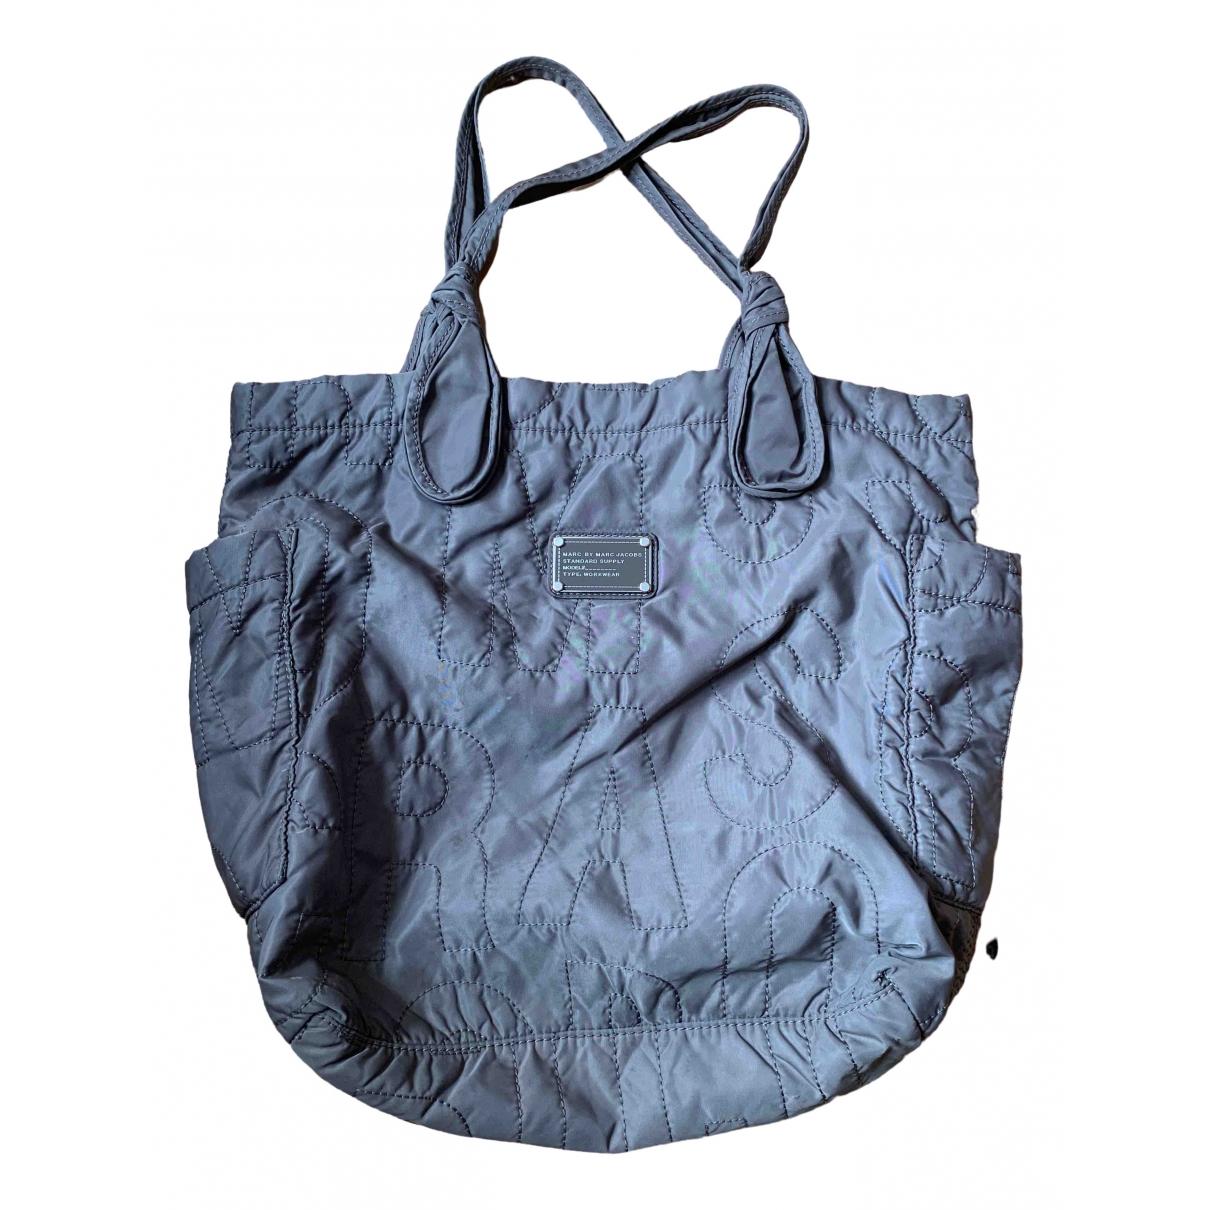 Marc By Marc Jacobs \N Grey handbag for Women \N